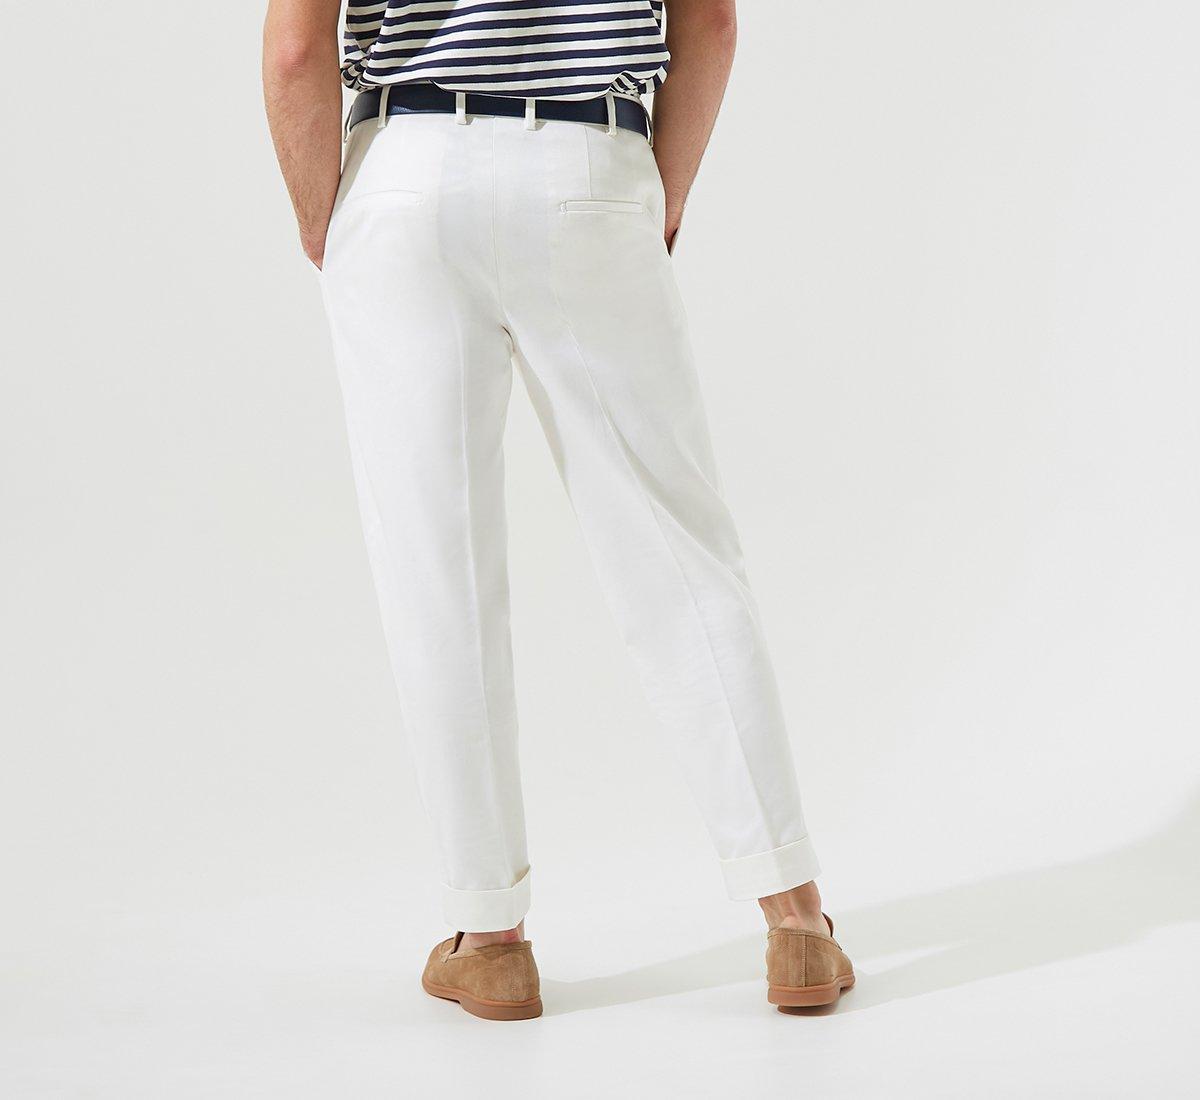 Cotton chinos